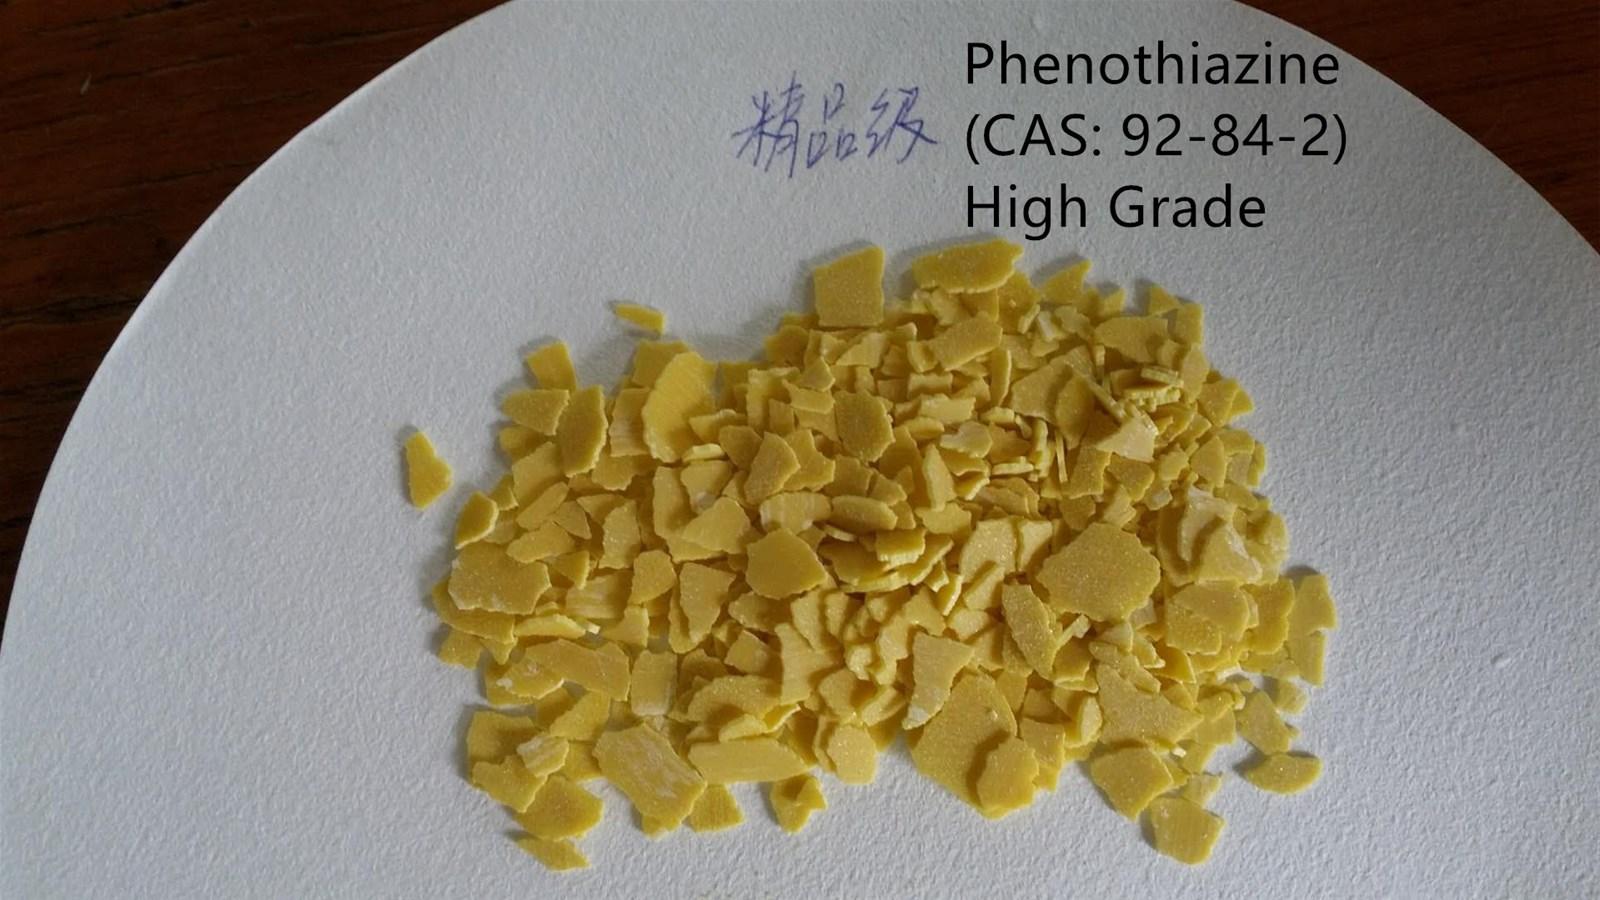 Phenothiazine CAS 92842 Raw Material for Crylic Acid